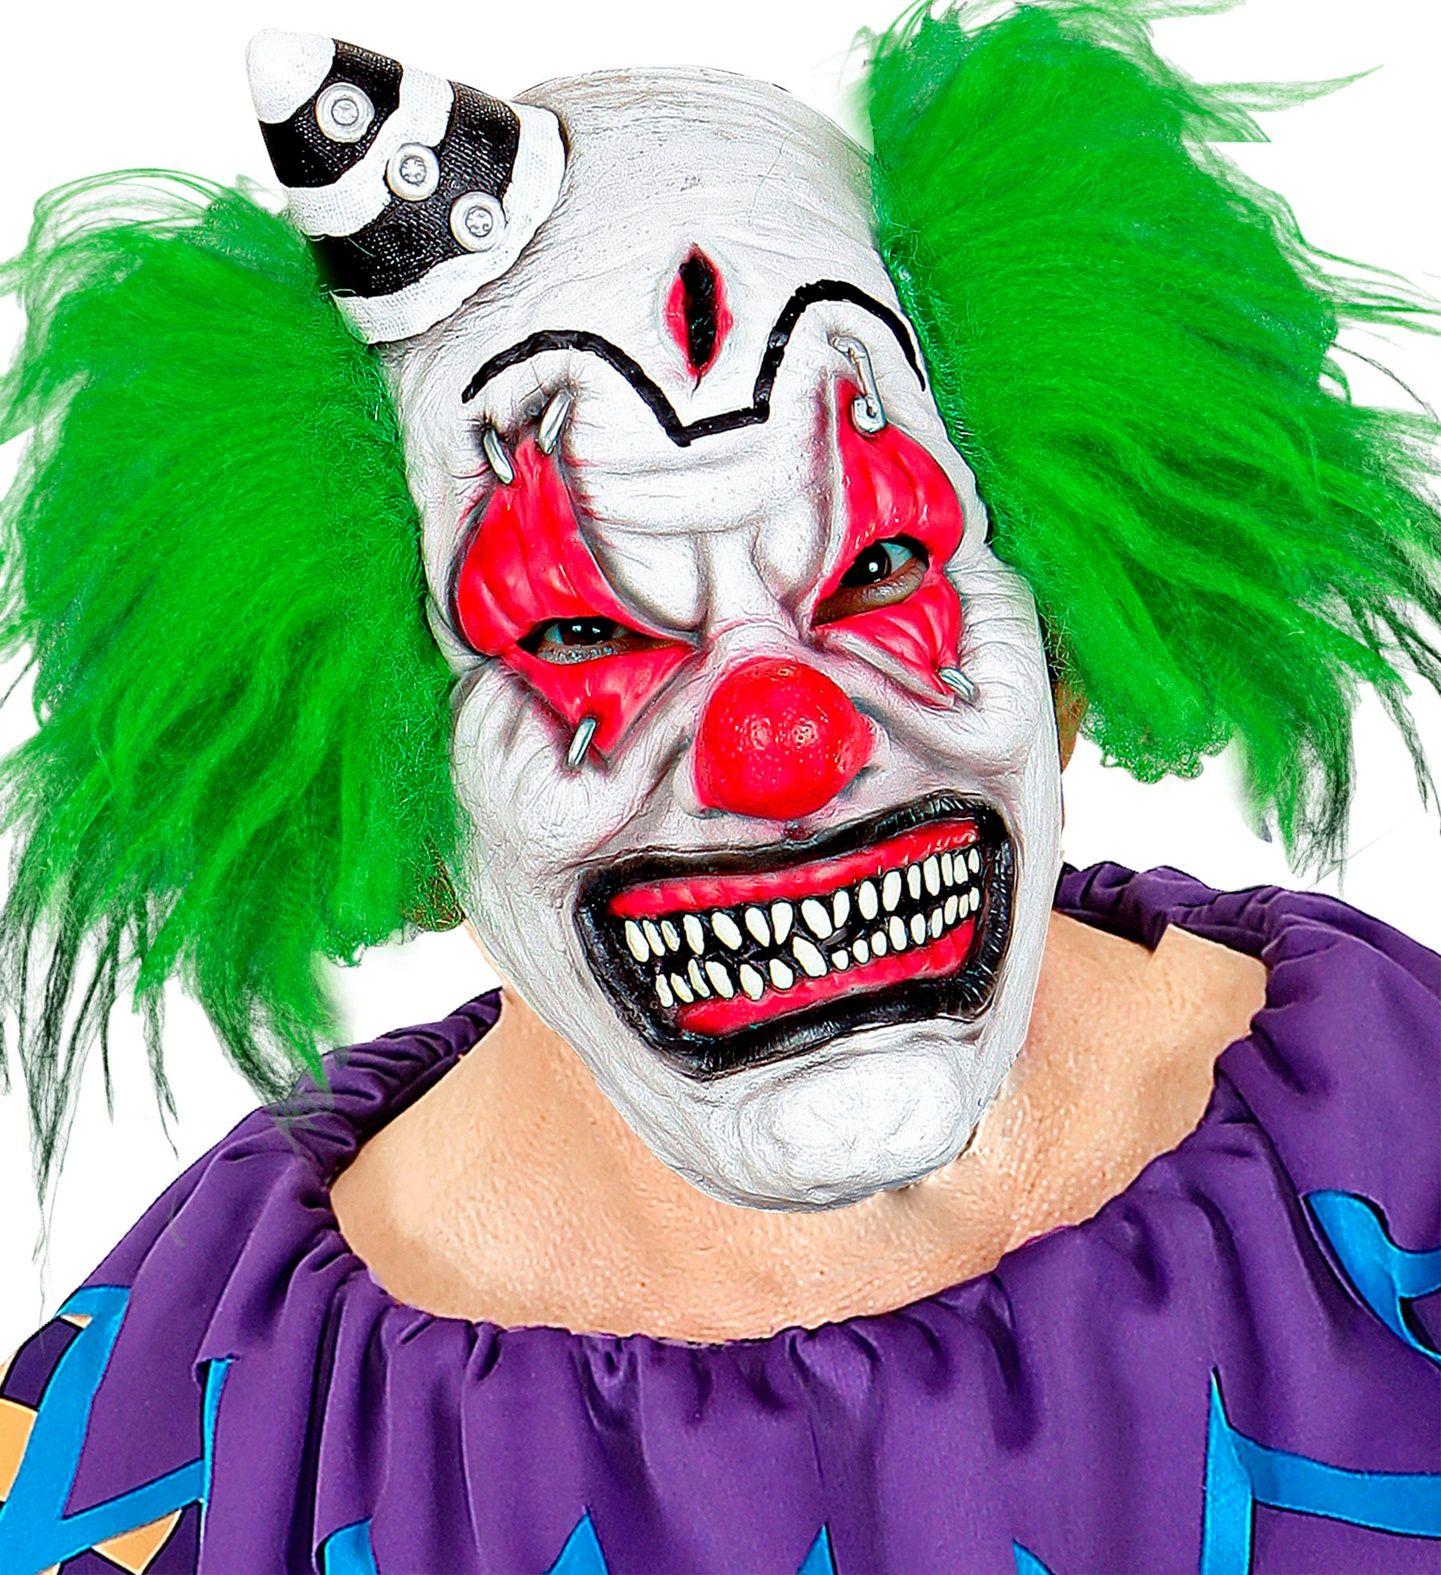 Killer clown masker met hoedje en haar